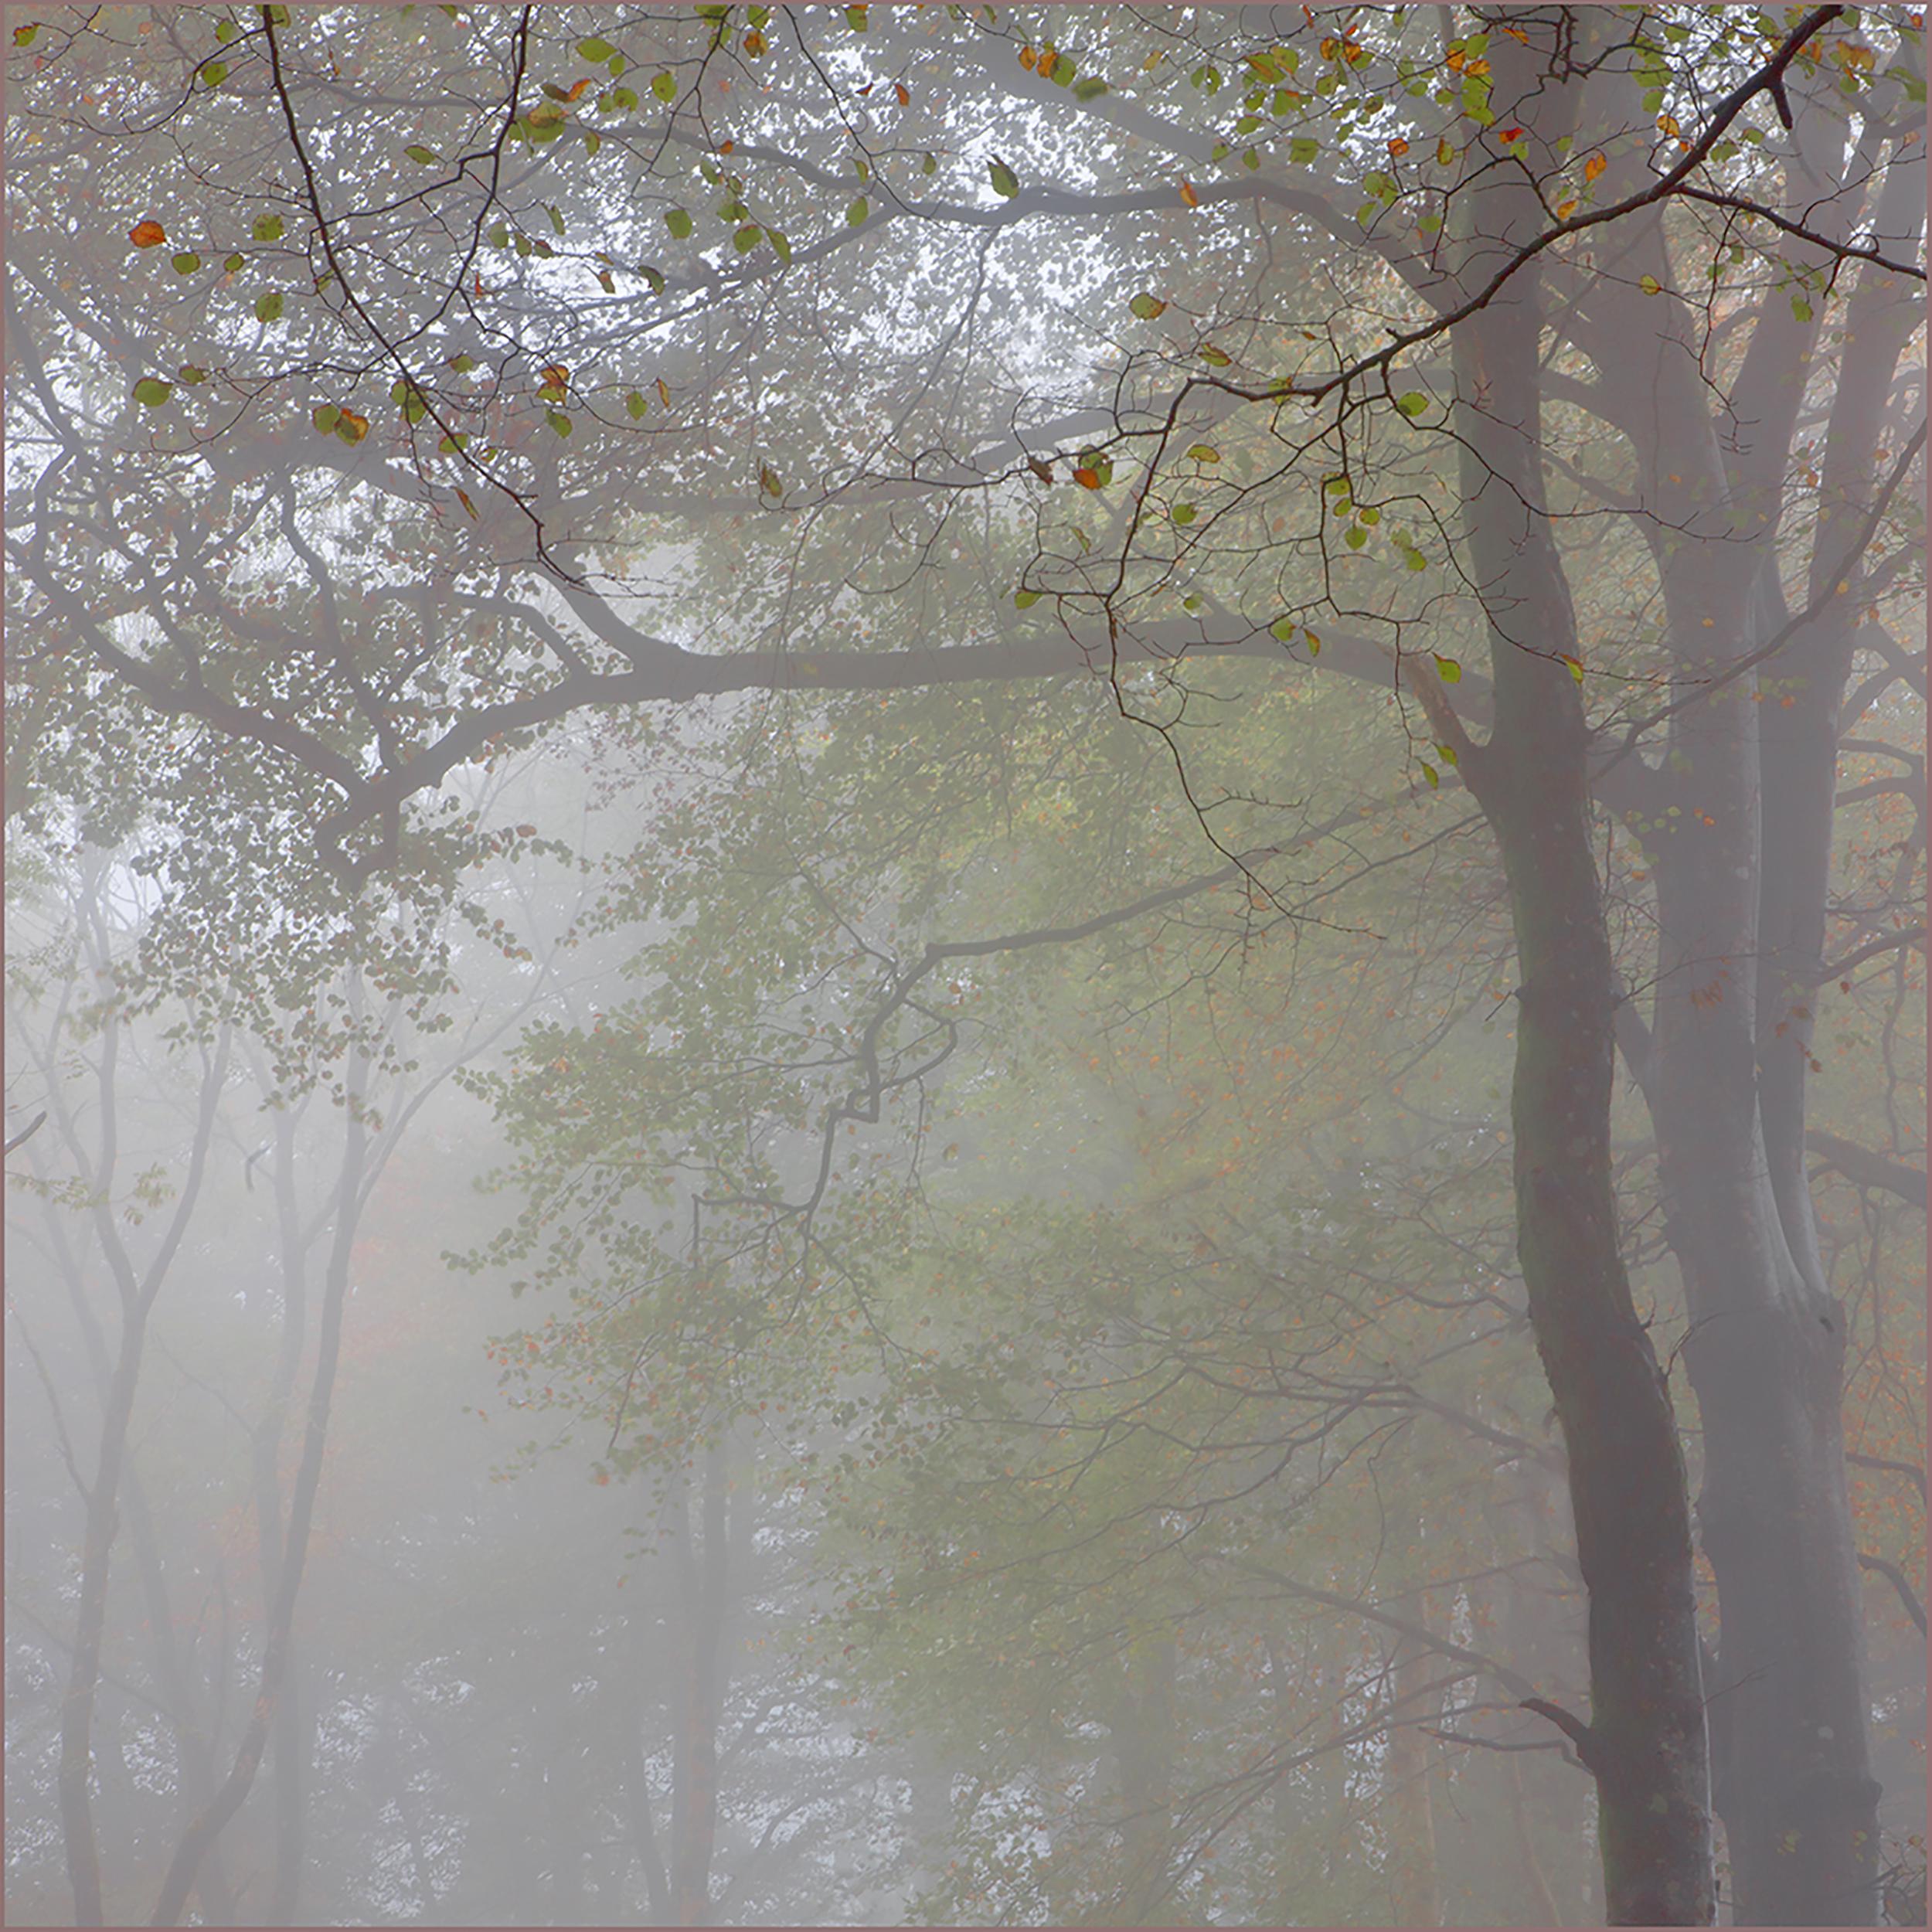 Mist at Lukesland.jpg